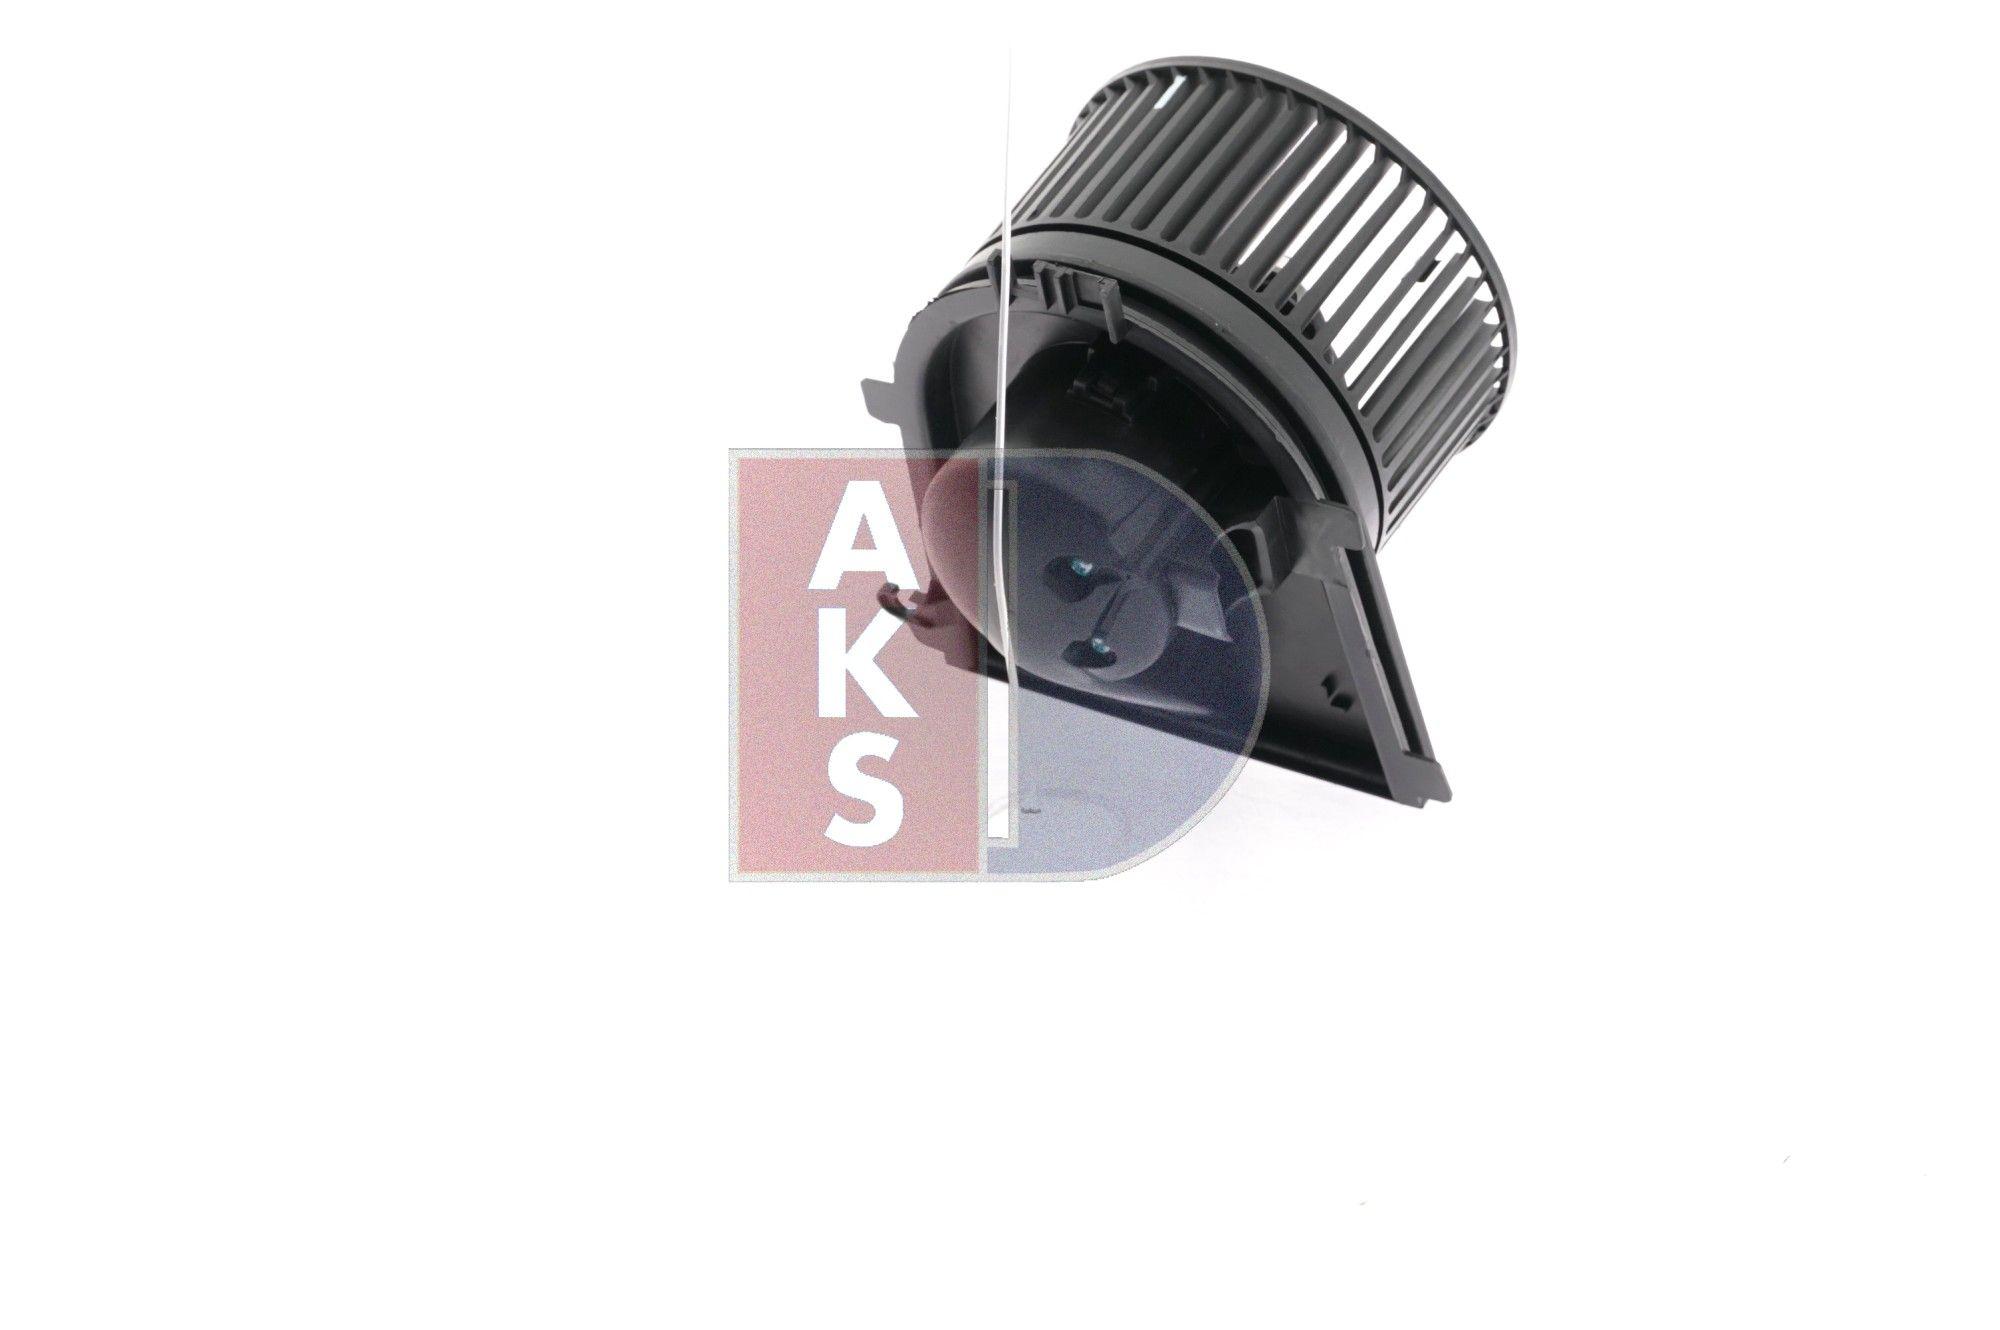 740934N AKS DASIS zu niedrigem Preis